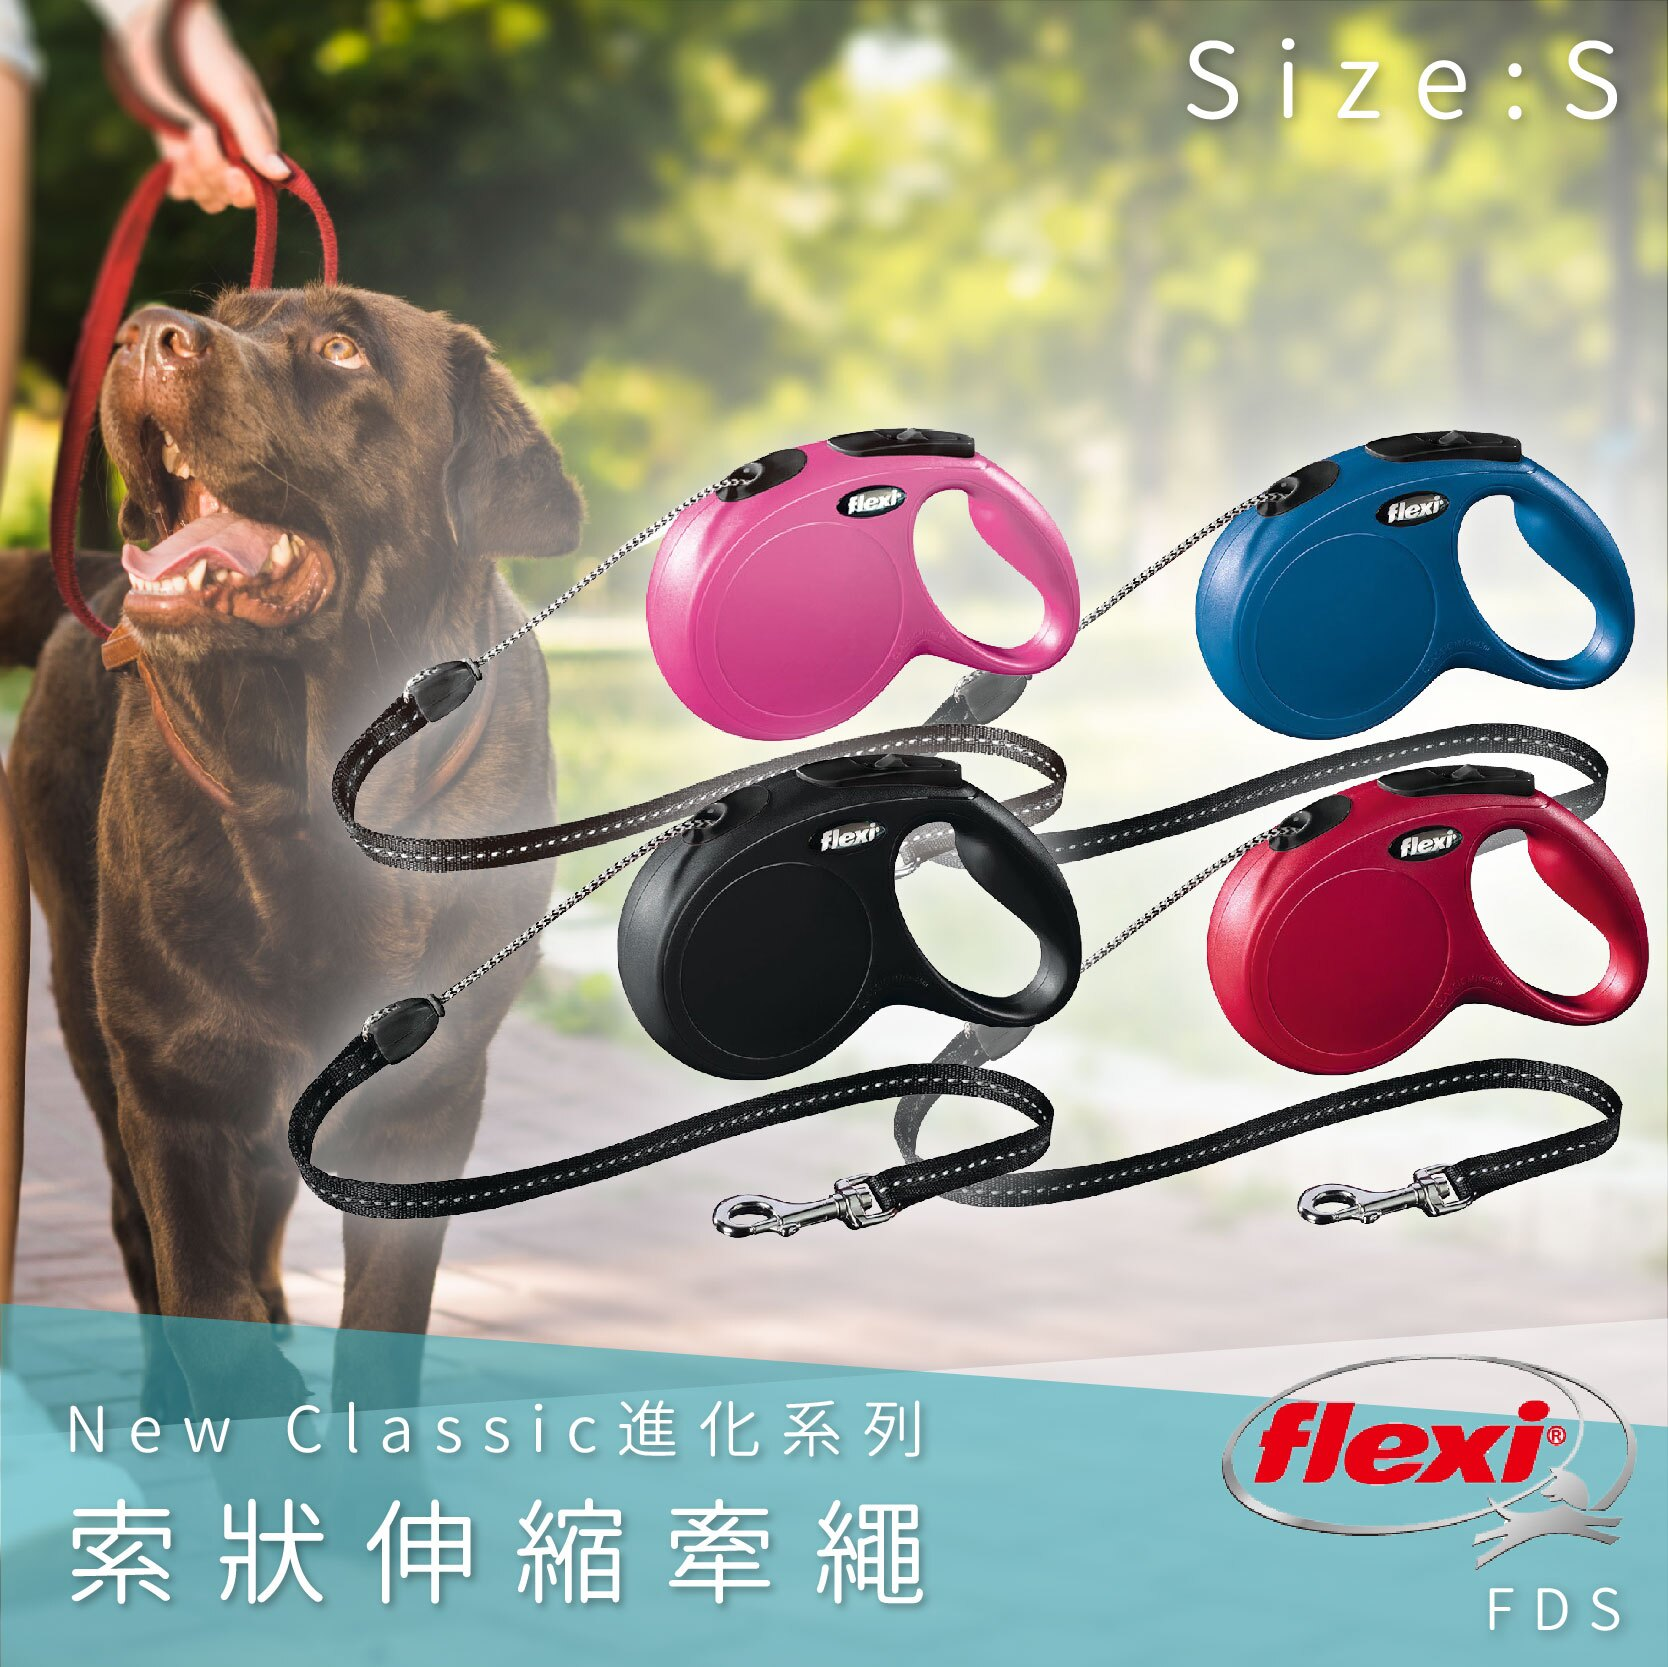 Flexi飛萊希 索狀伸縮牽繩 S FDS 進化系列 舒適握把 狗貓 外出用品 寵物用品 寵物牽繩 德國製 四色